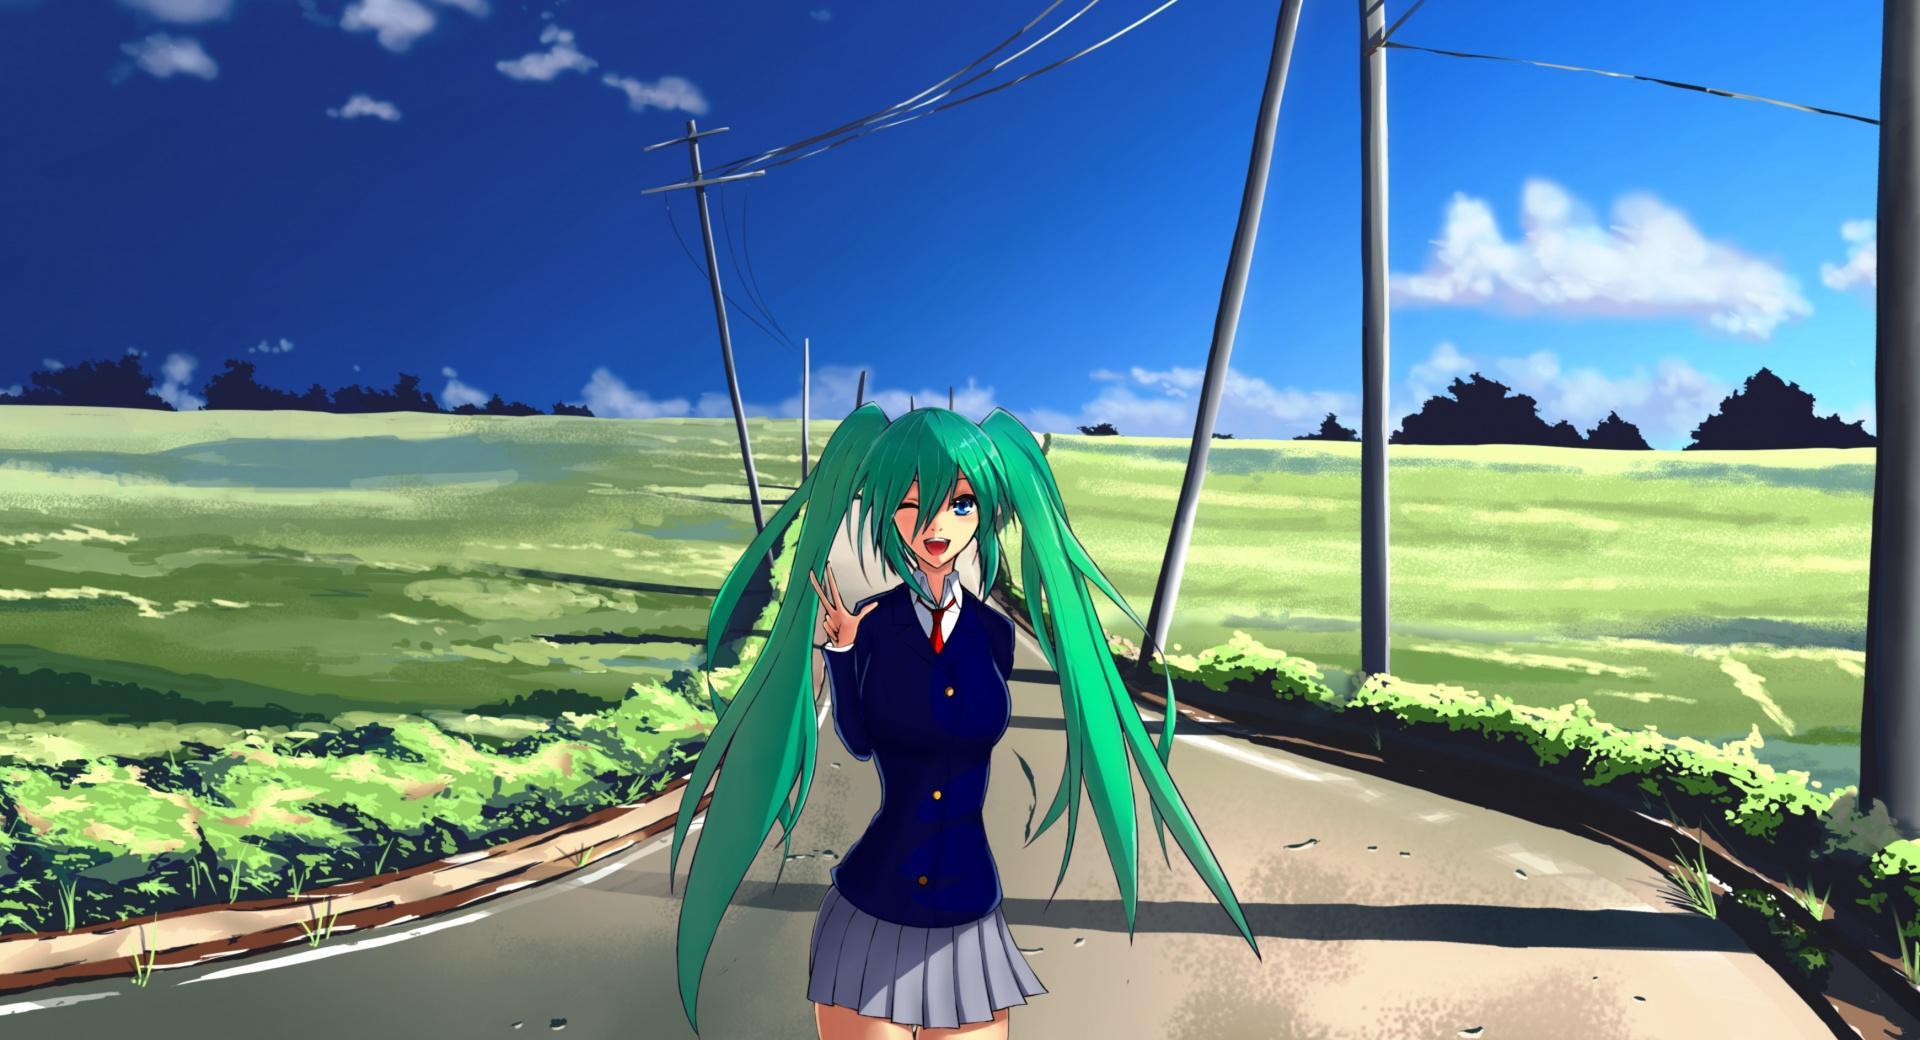 Hatsune Miku Green Hair wallpapers HD quality